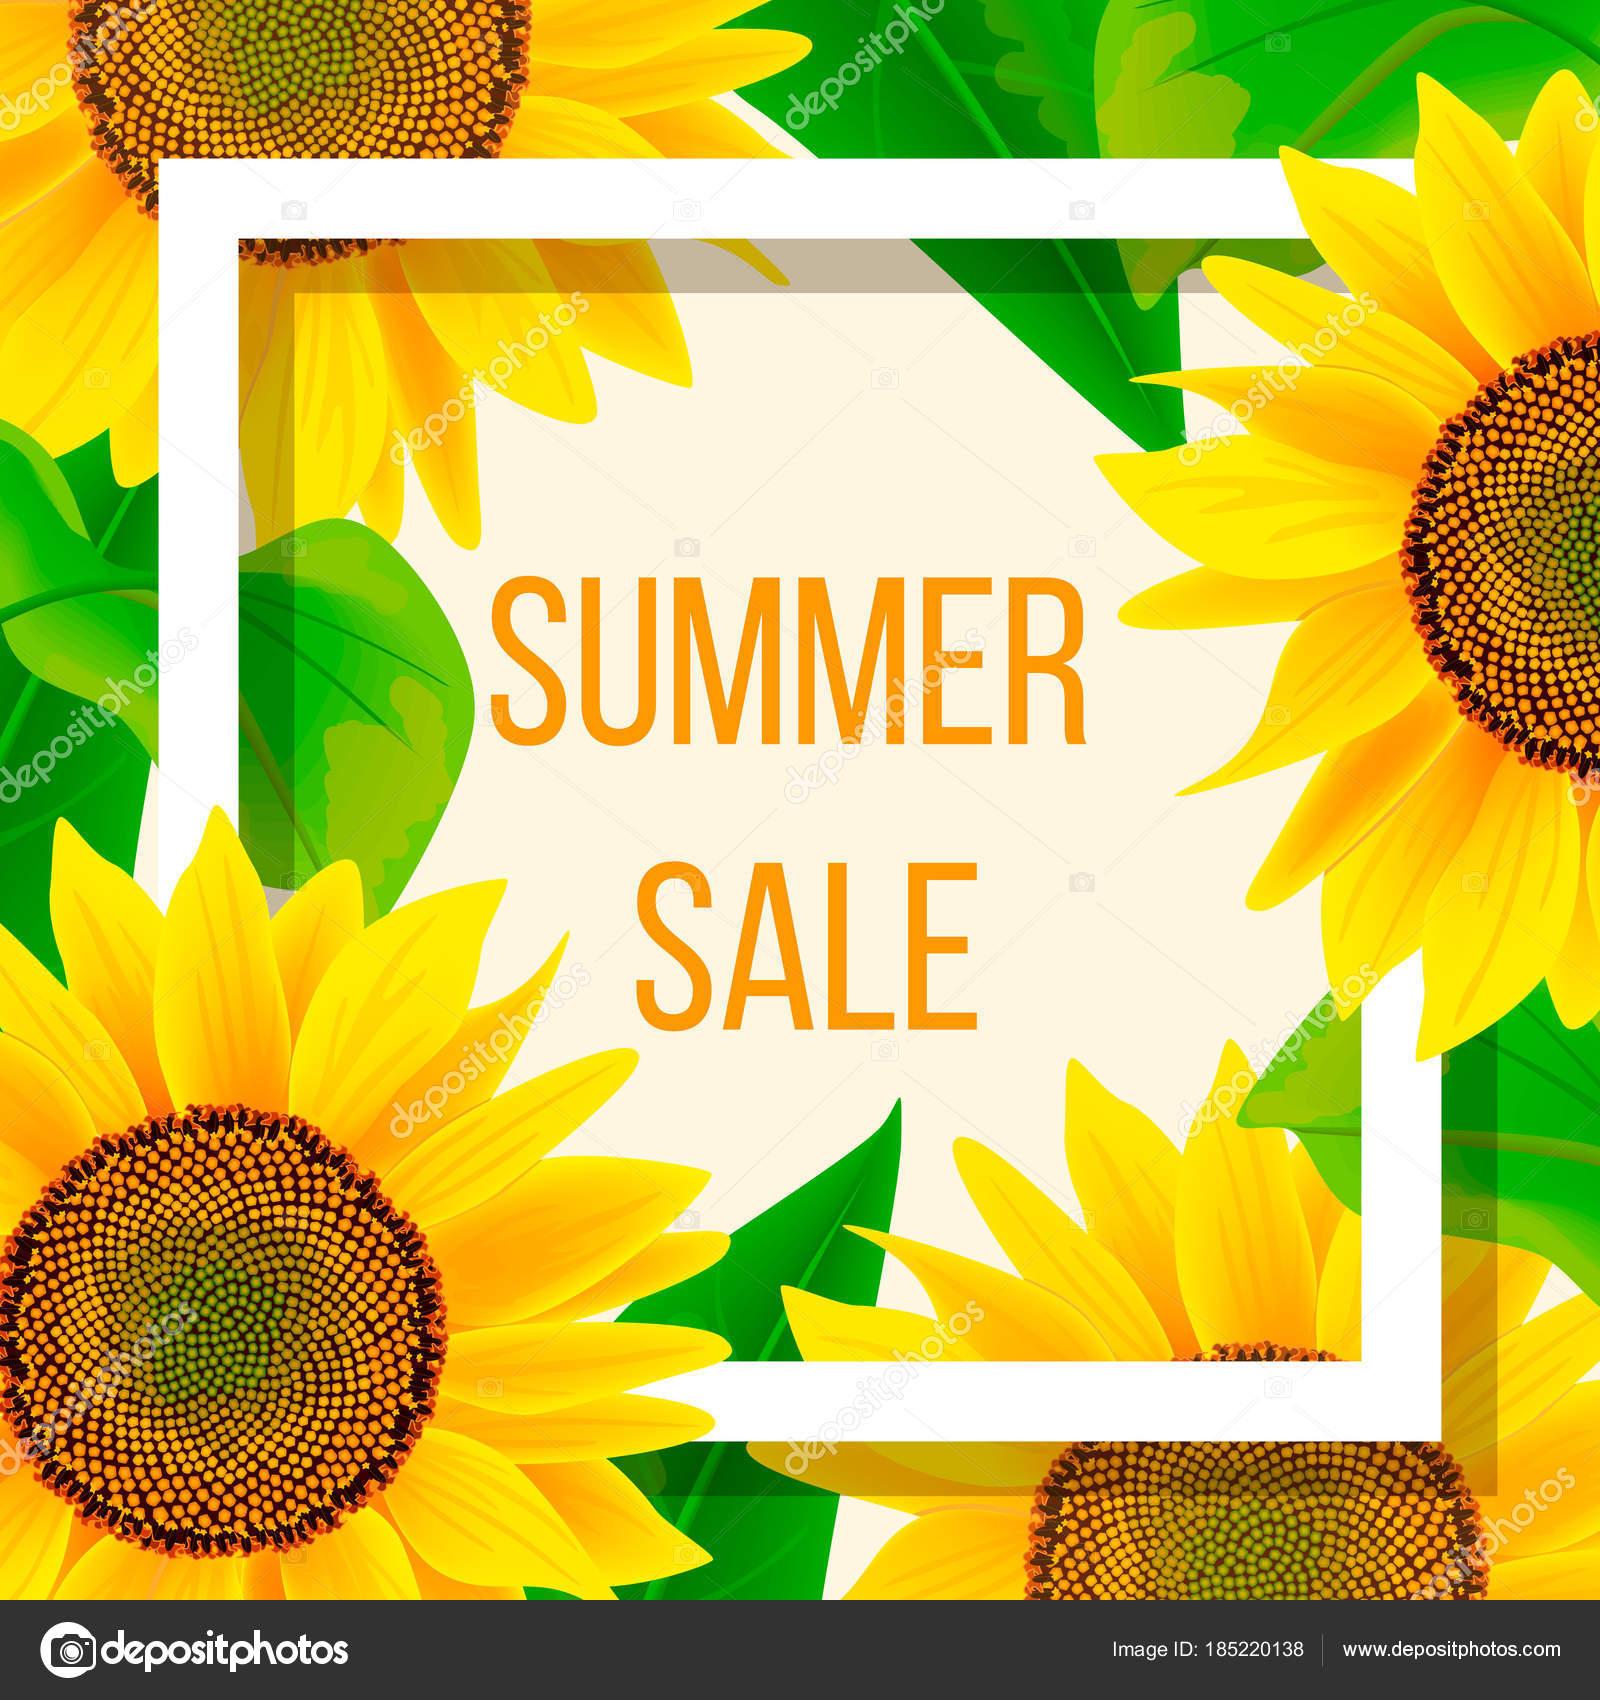 Sommer Sale Banner Vorlage mit Sonnenblume, Vektor-illustration ...